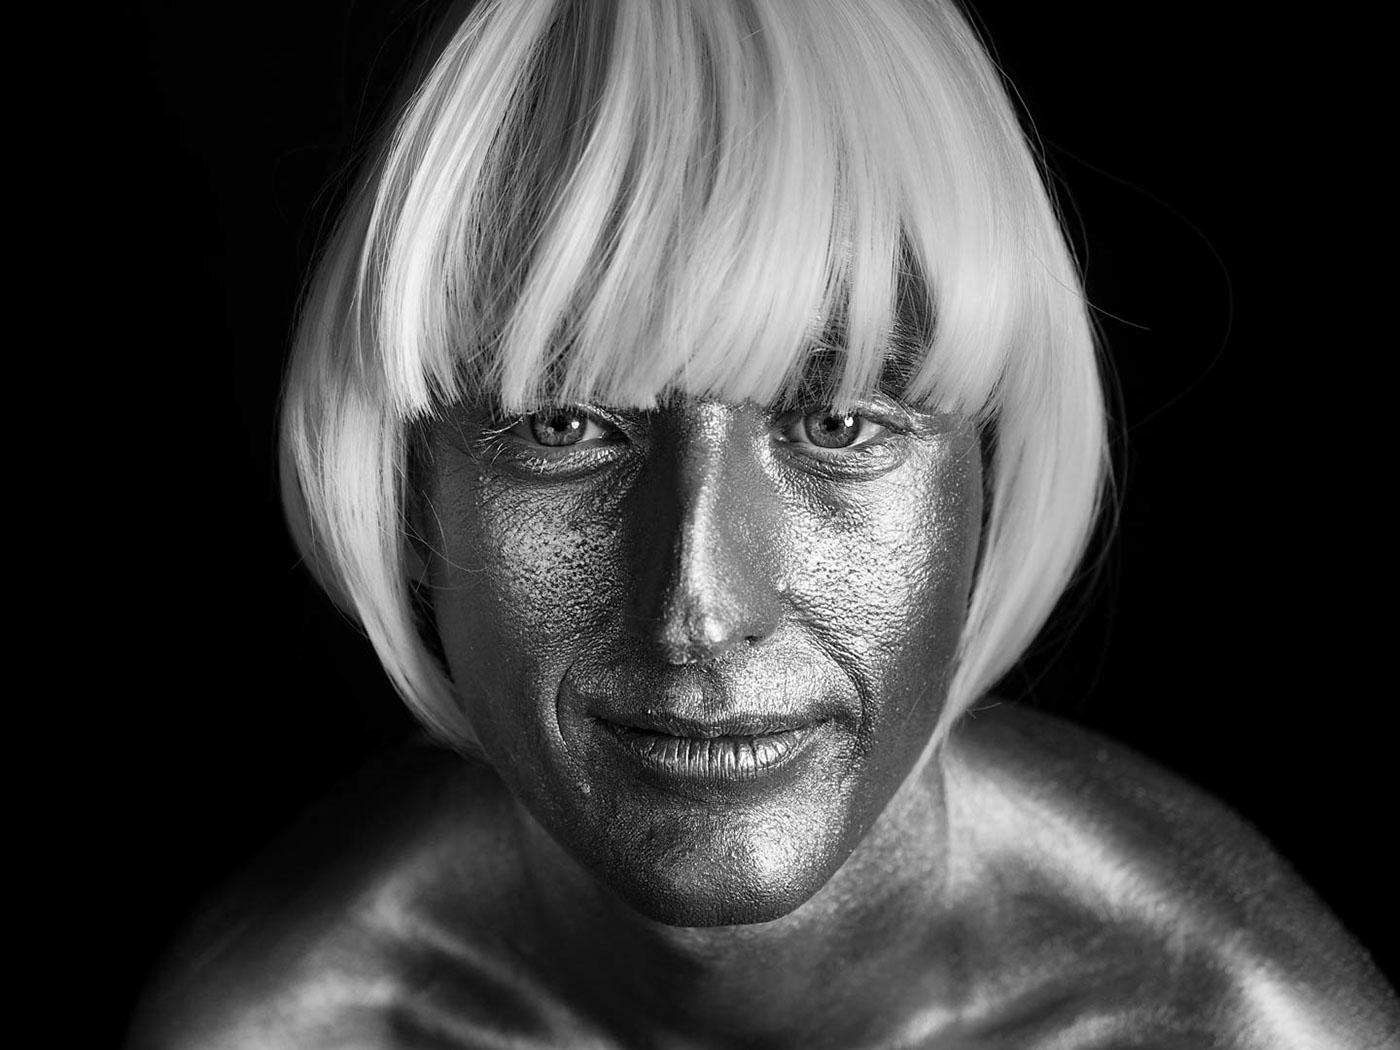 portrait,silver,monochrome,model